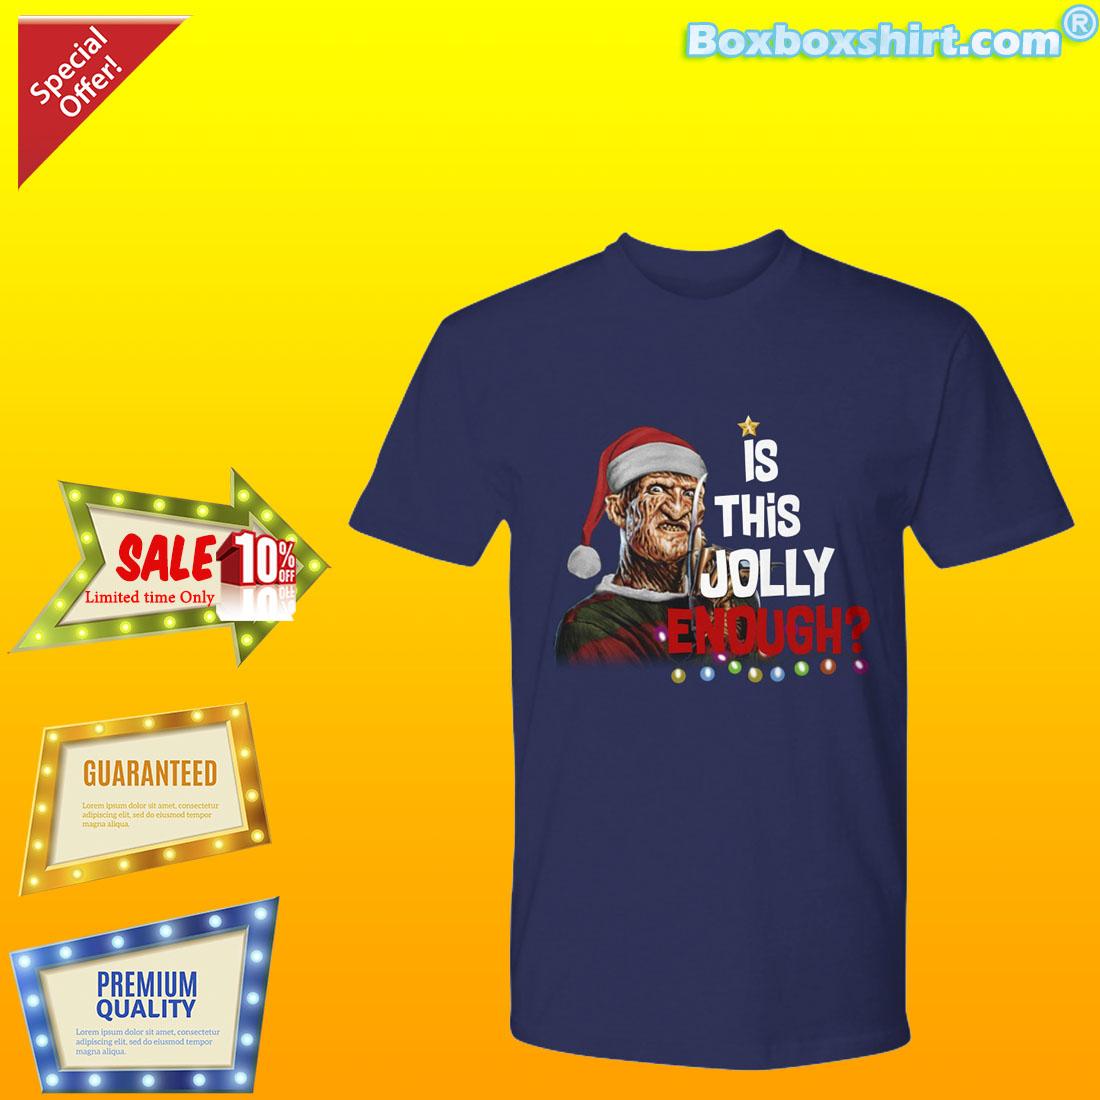 744853191 Is this jolly enough Freddy Krueger shirt - boxboxshirt's diary